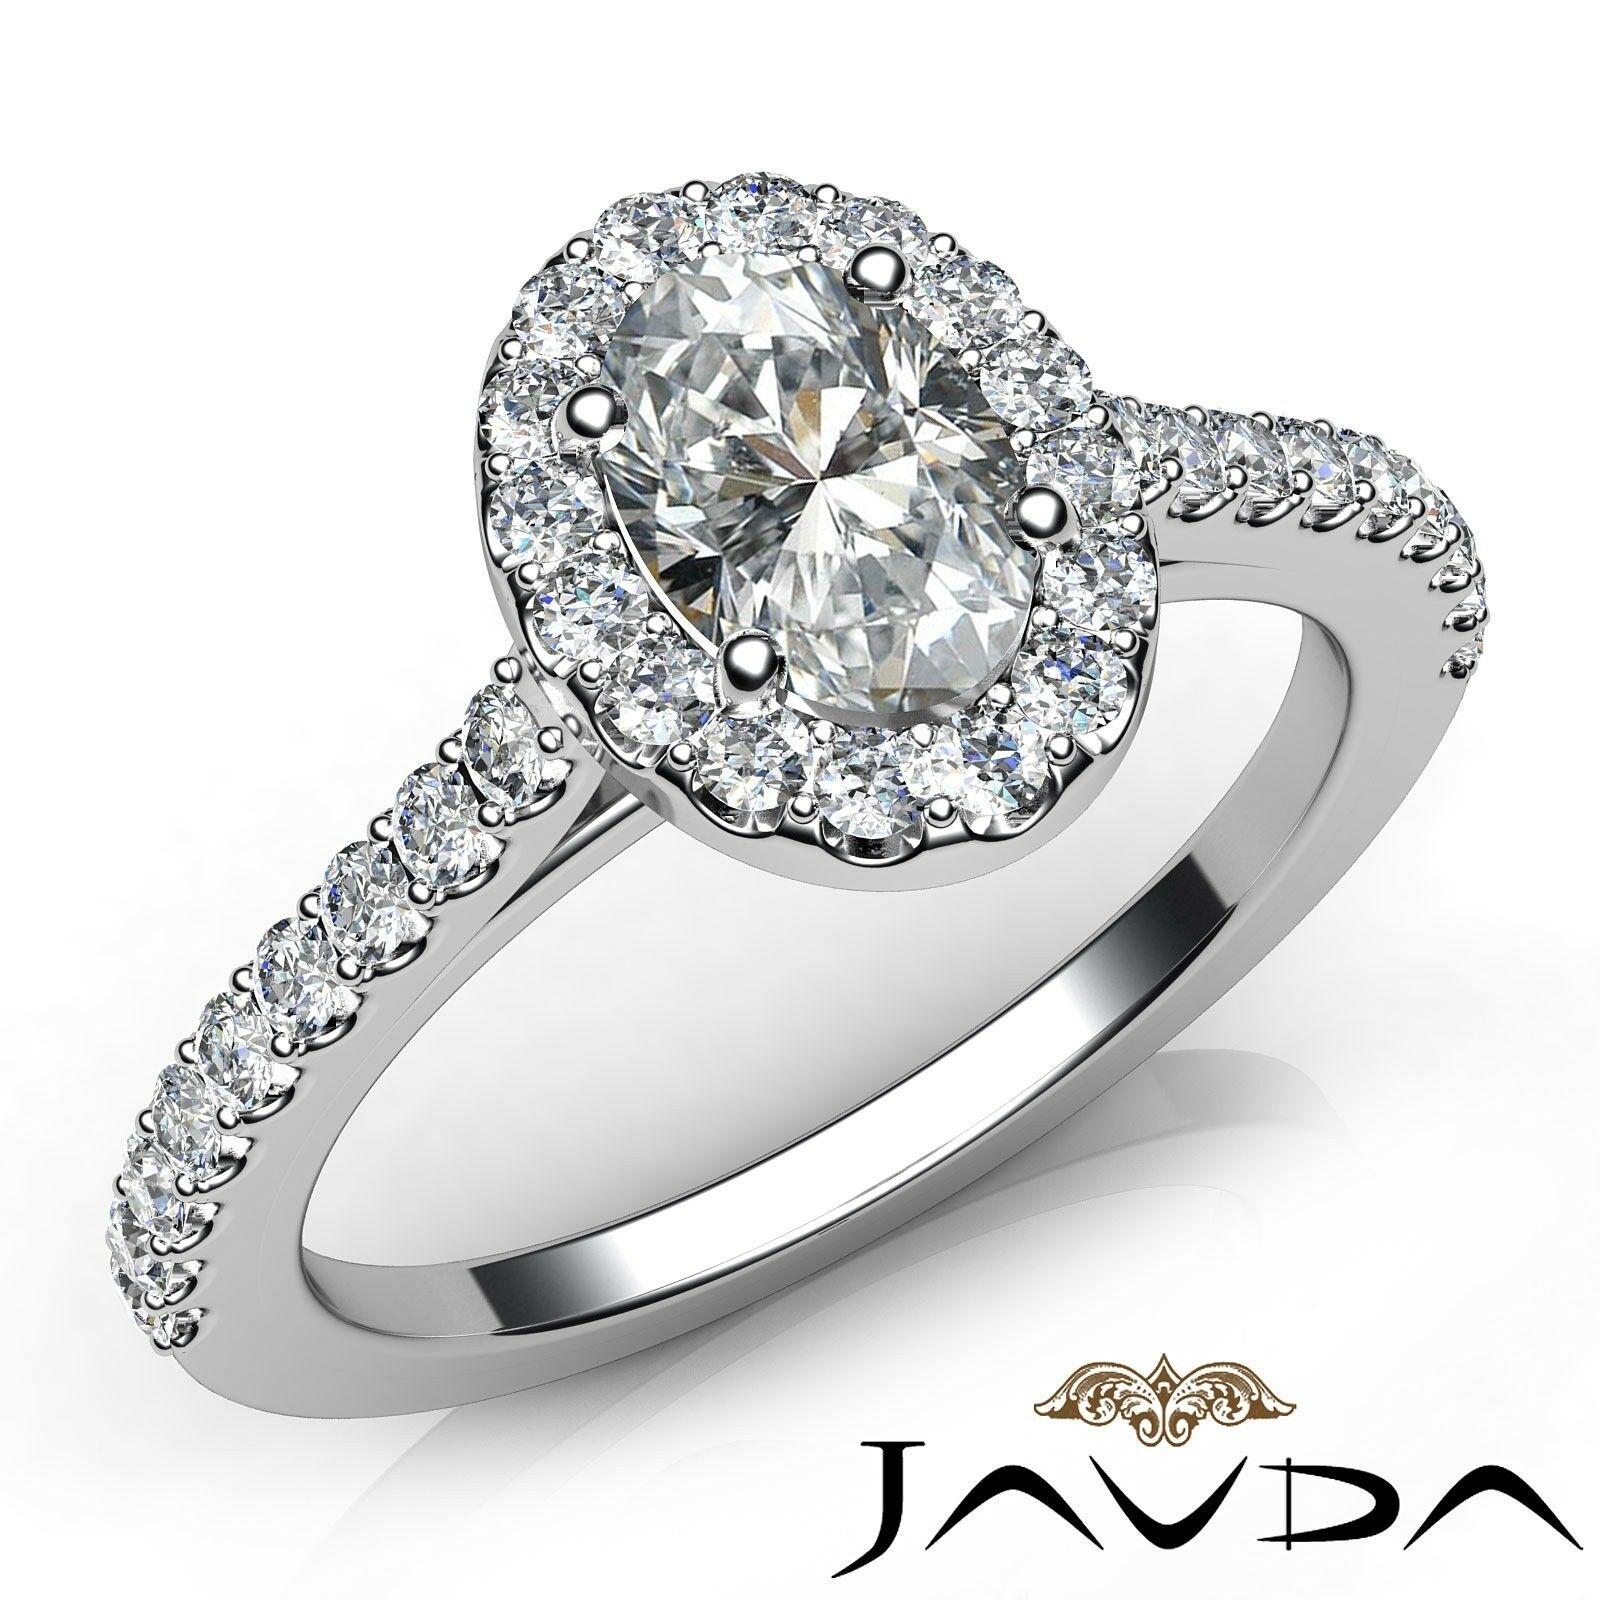 1.6ctw Prong Setting Oval Diamond Engagement Ring GIA H-VS1 White Gold Women New